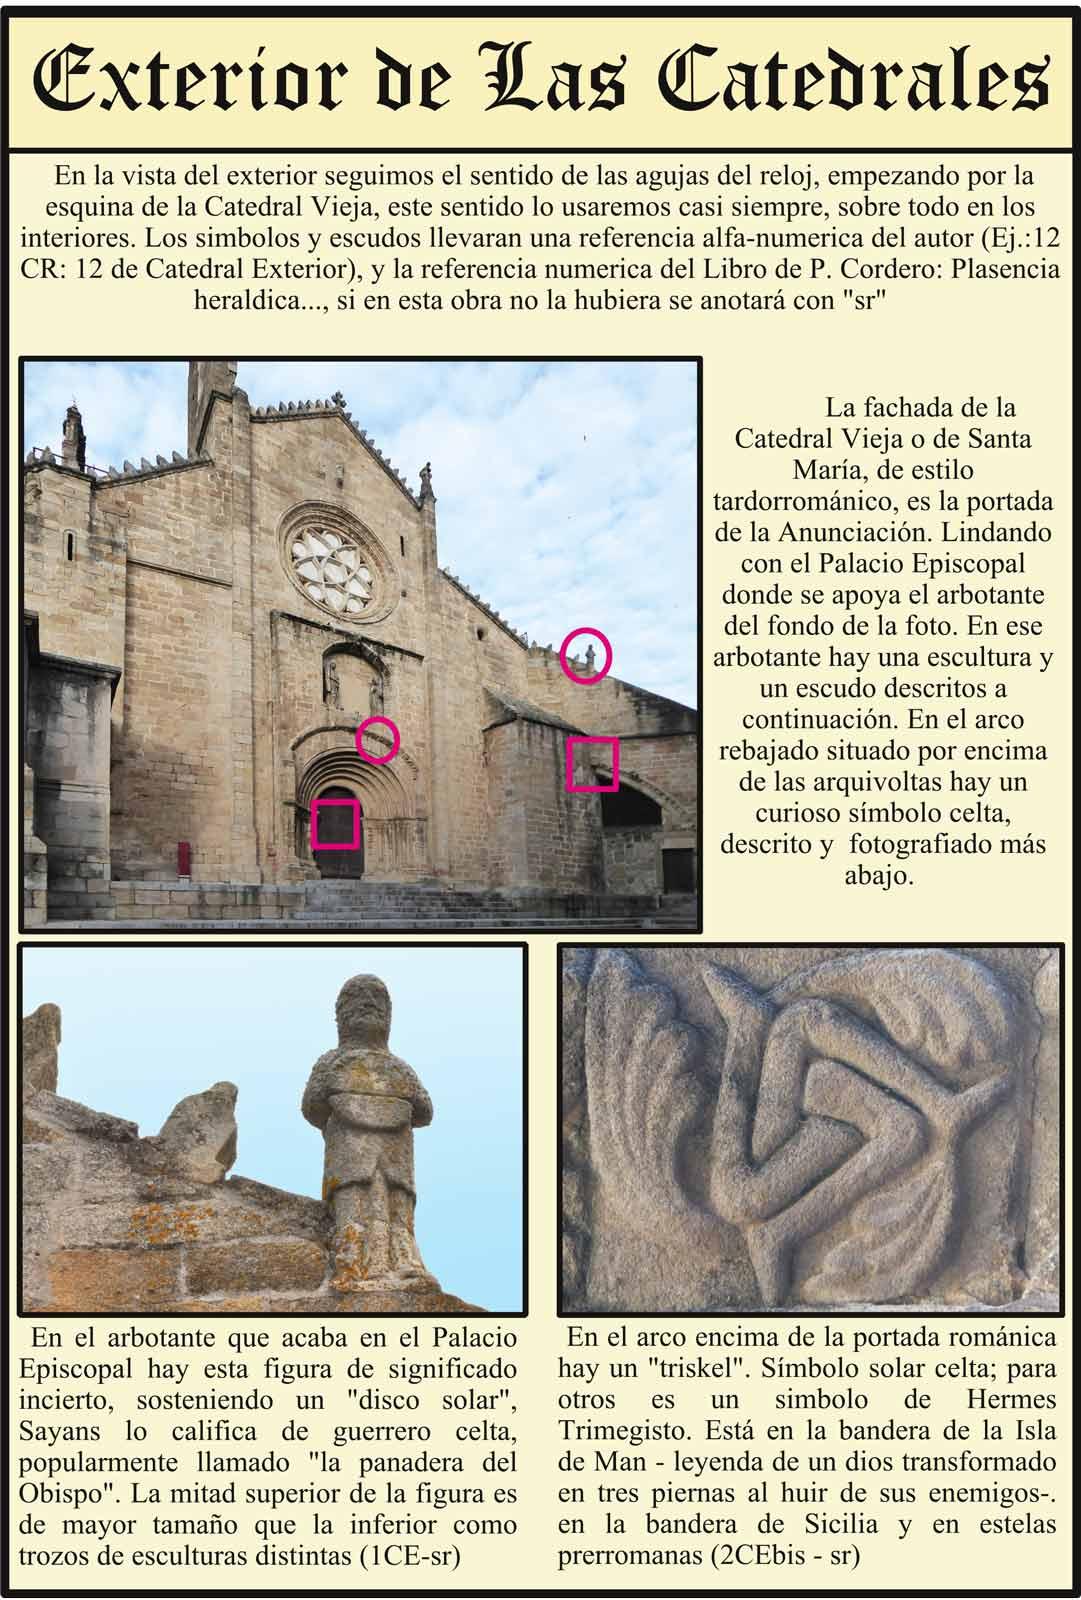 Portada romanica de la Catedral Vieja Plasencia Guerrero celta Triskel celta